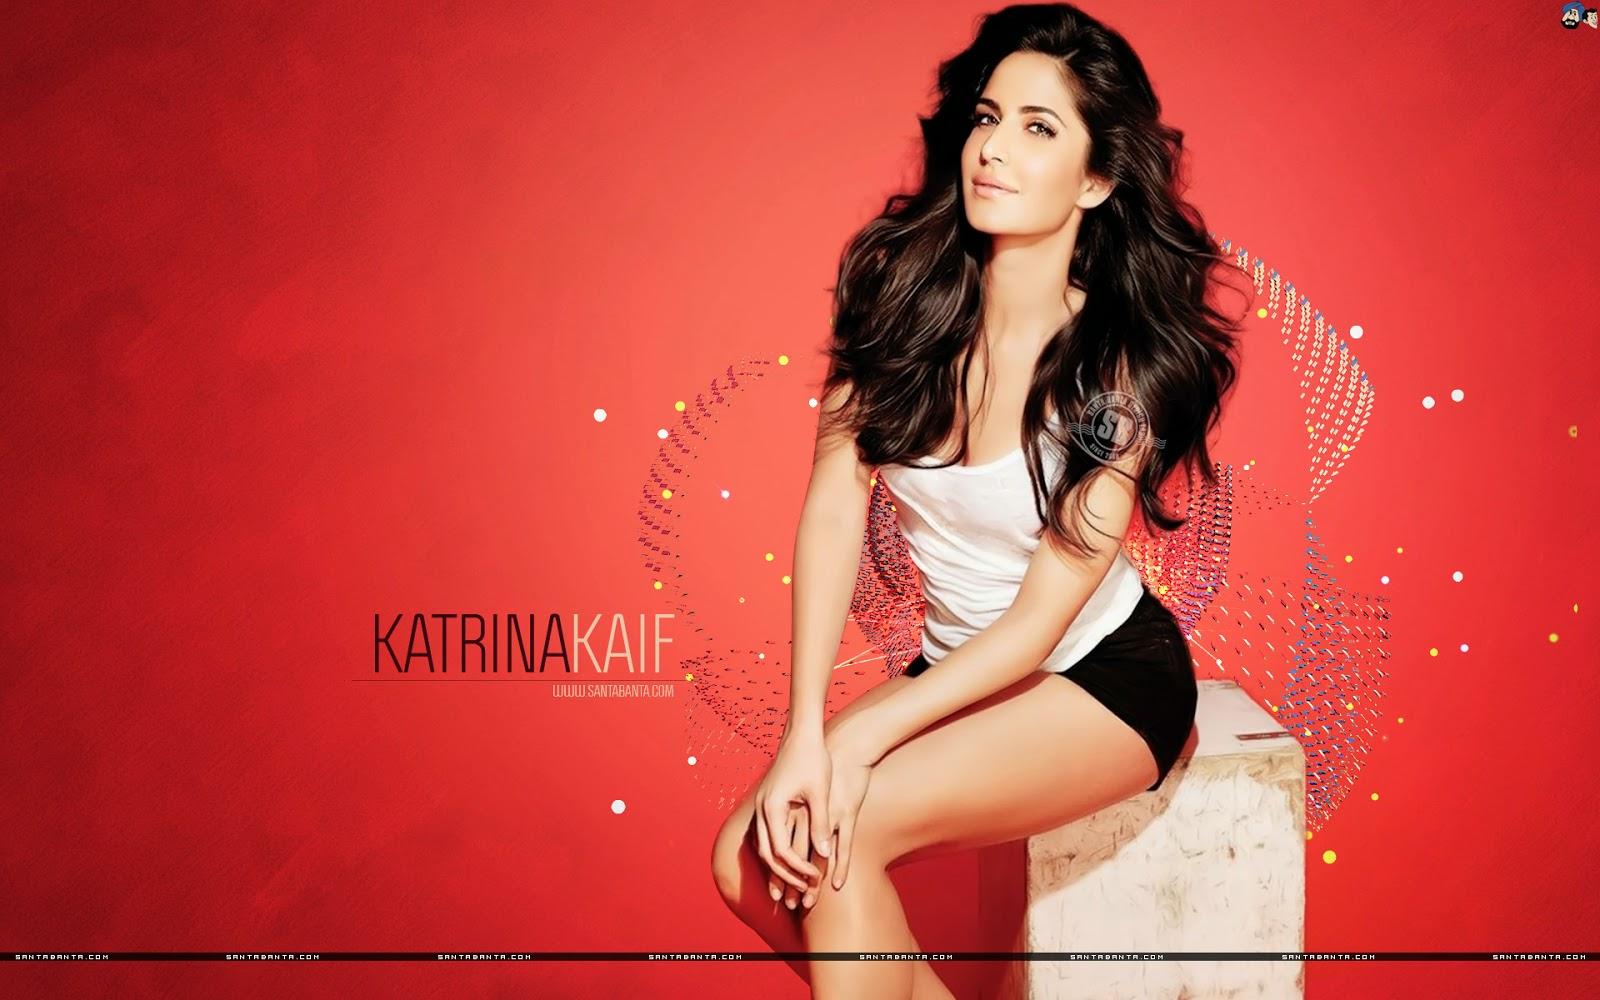 Katrina Kaif Seksi Wallpaper 17